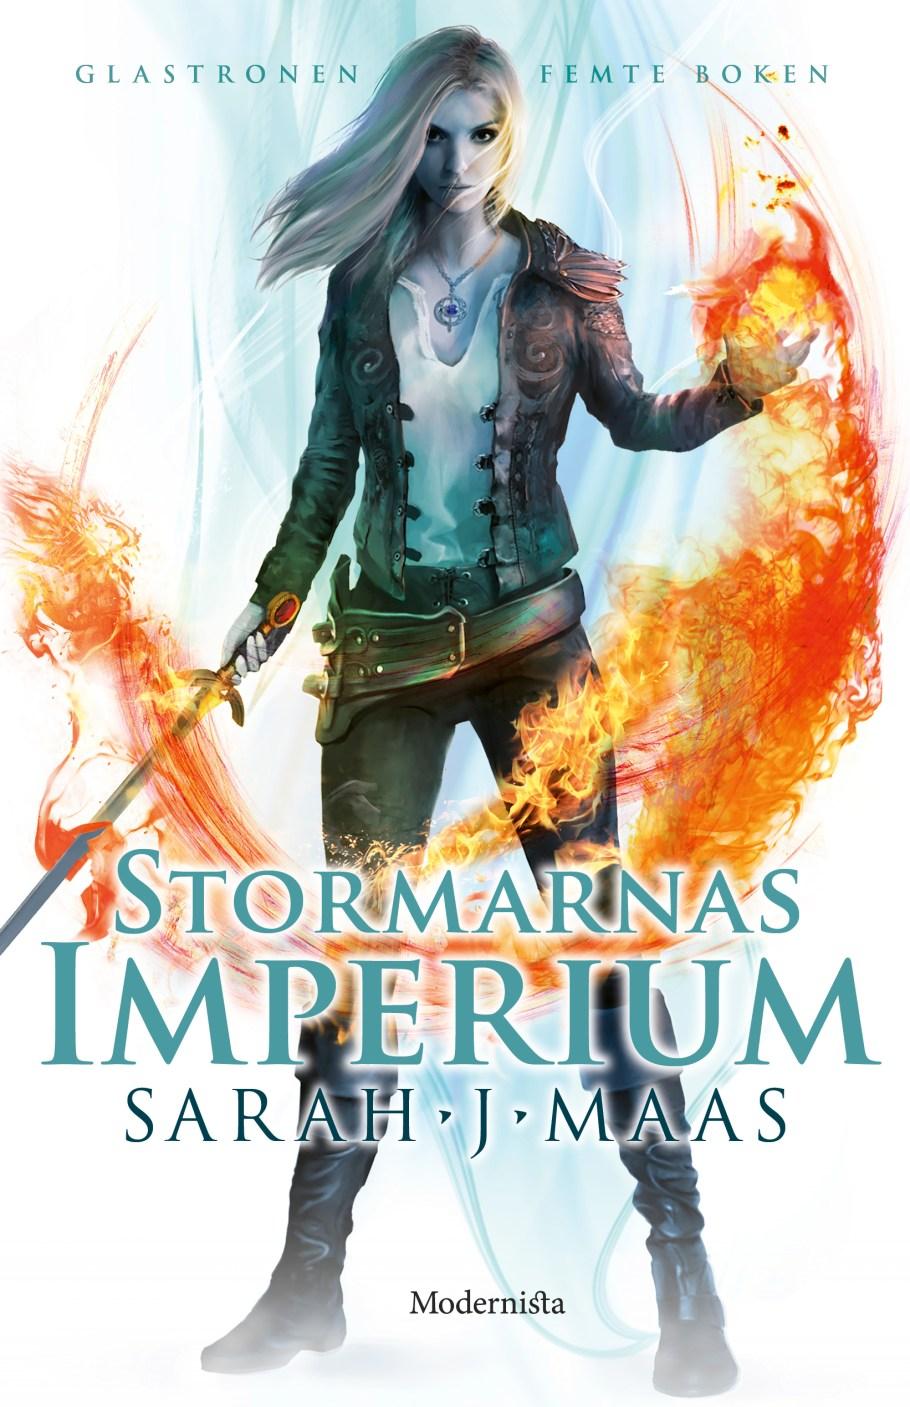 Stormarnas imperium av Sarah J Maas